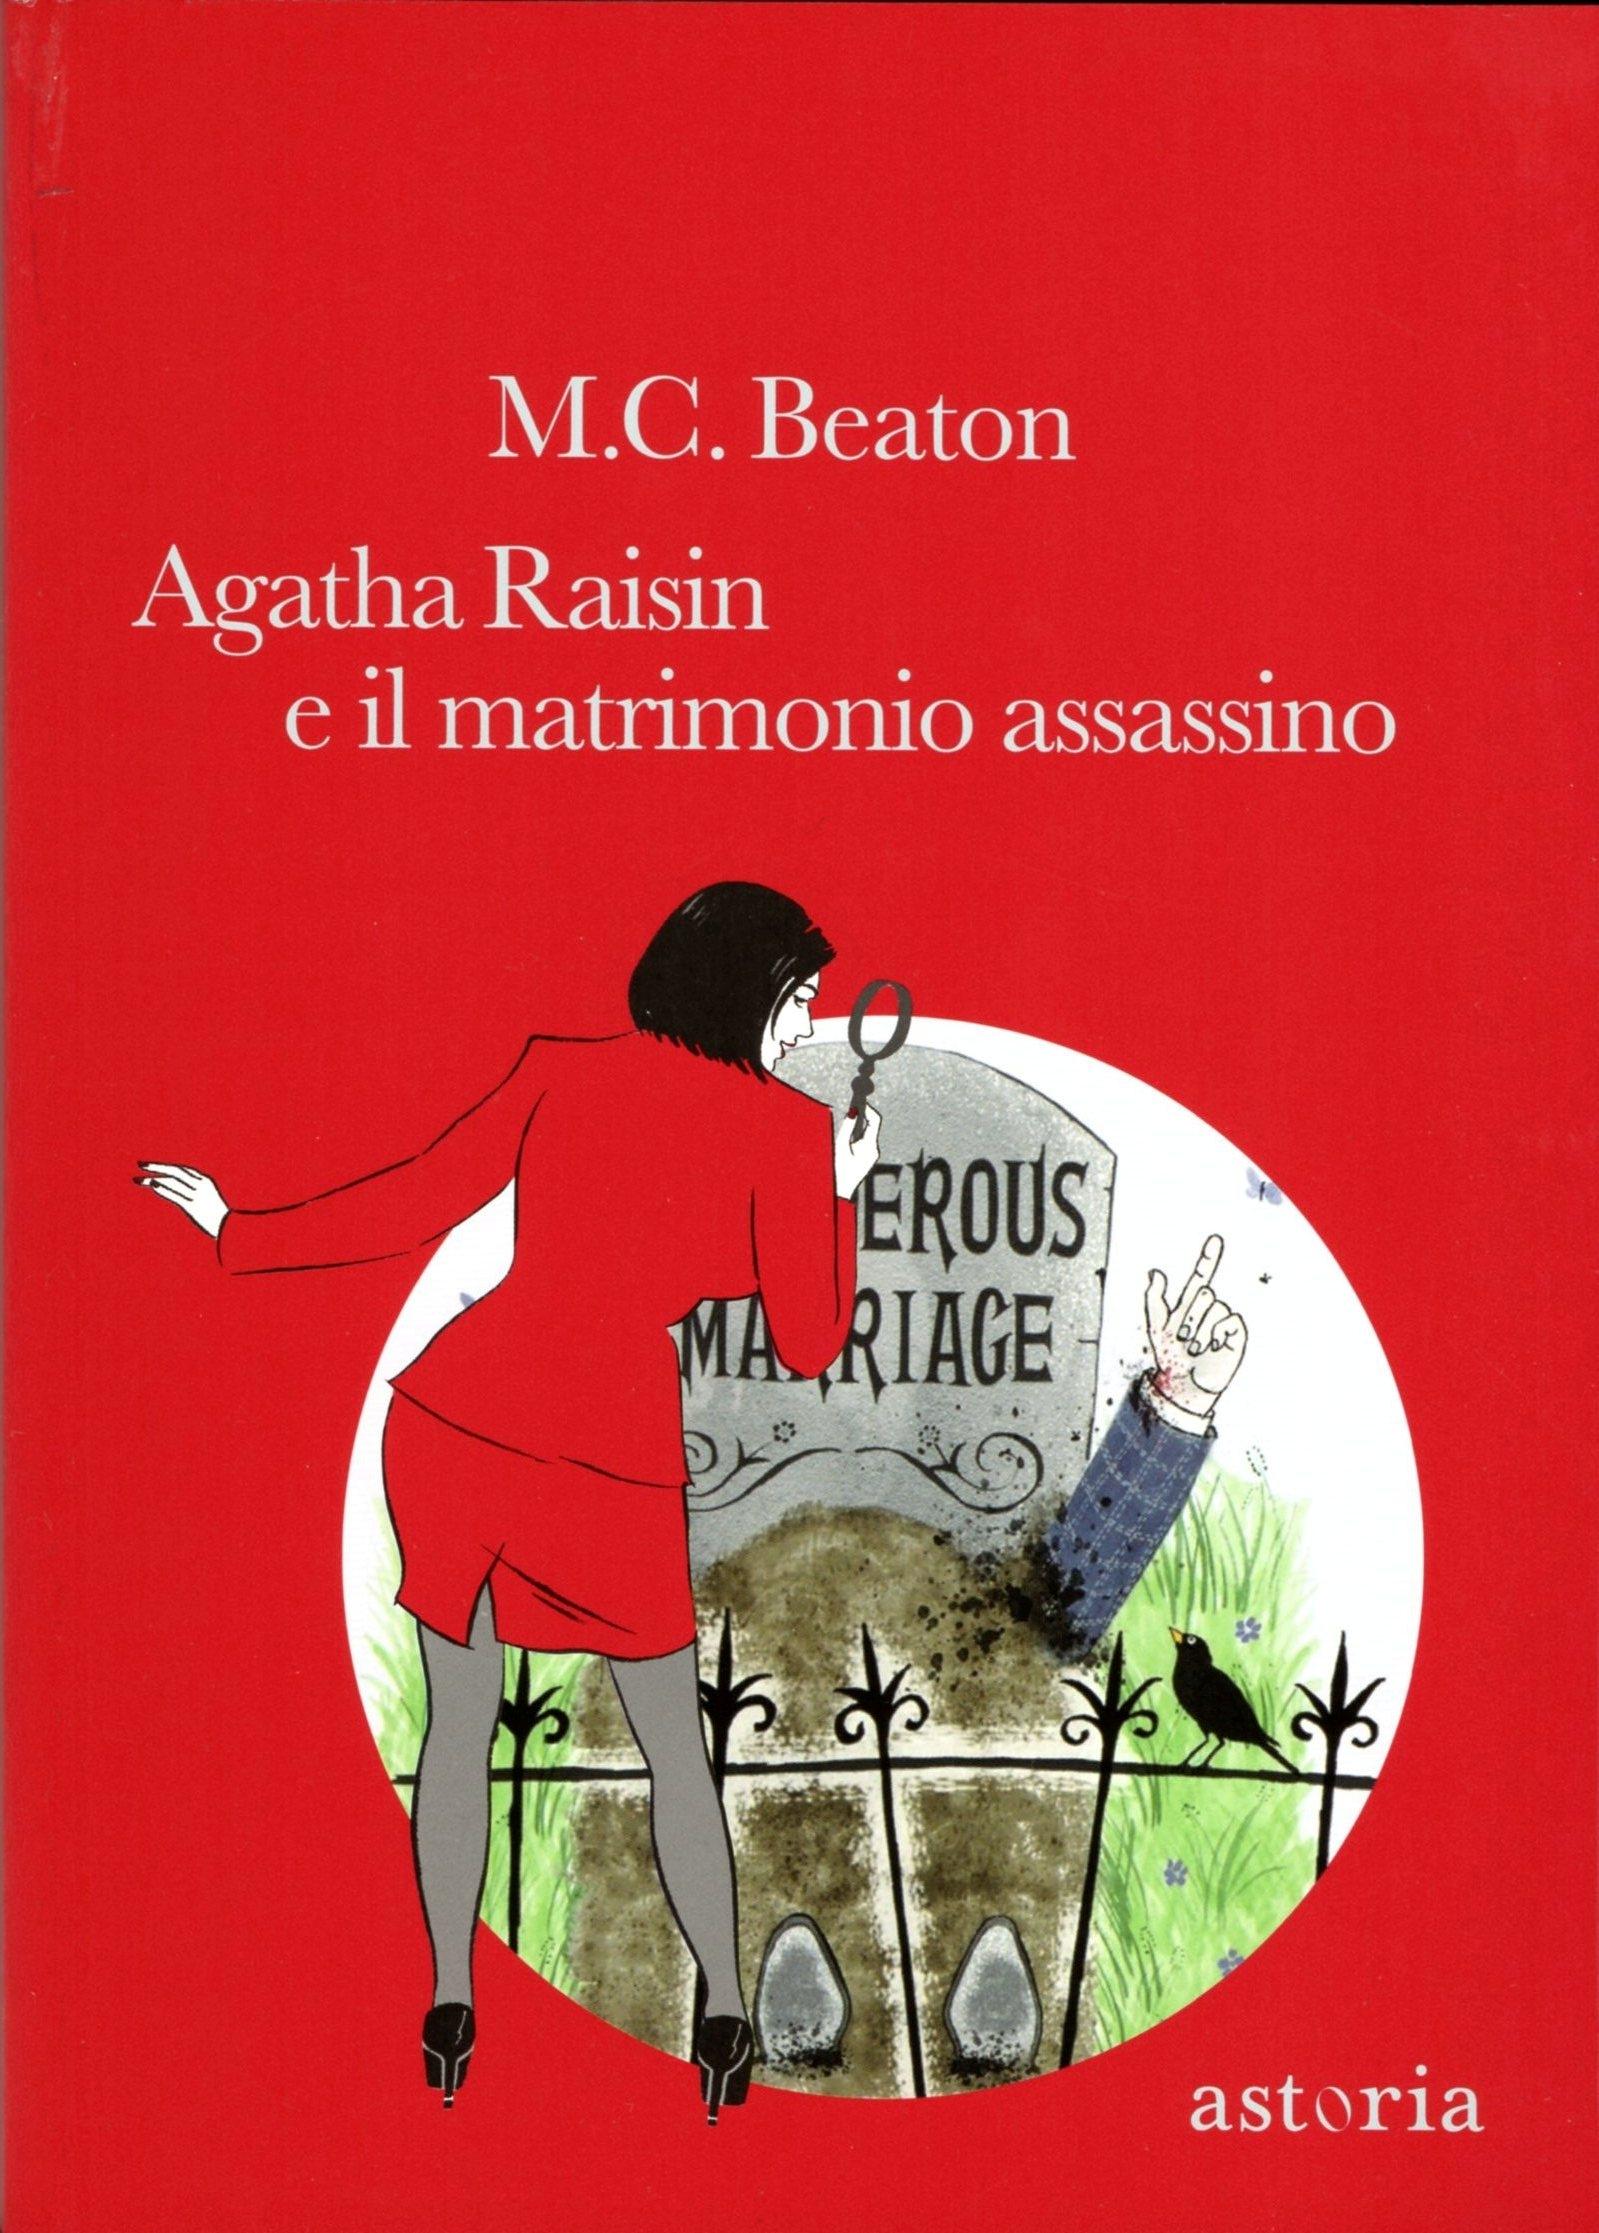 Agatha Raisin e il m...